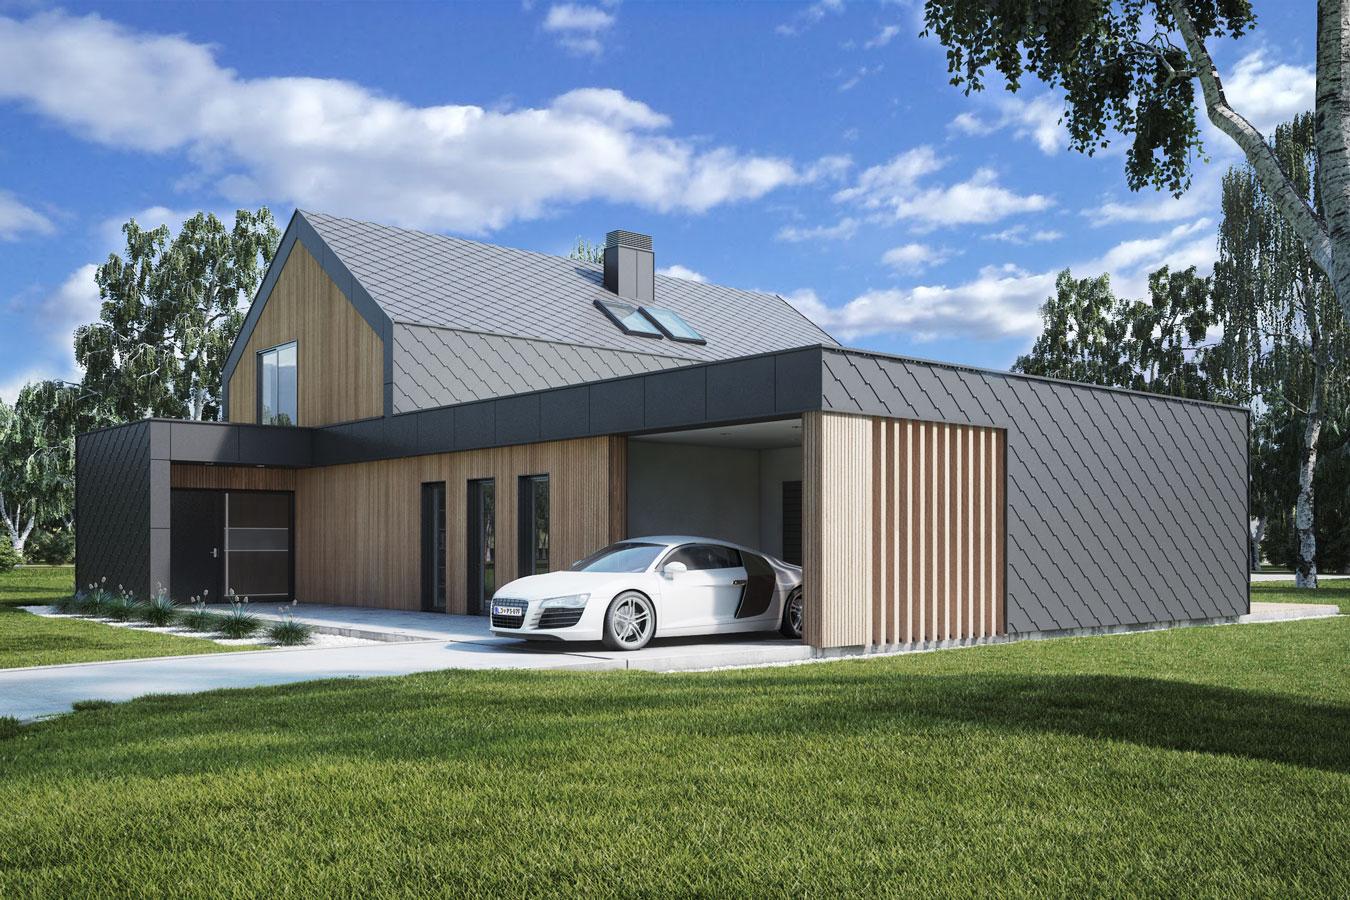 arhitekturni biro 2AMV načrtovanje gradbeno dovoljenje